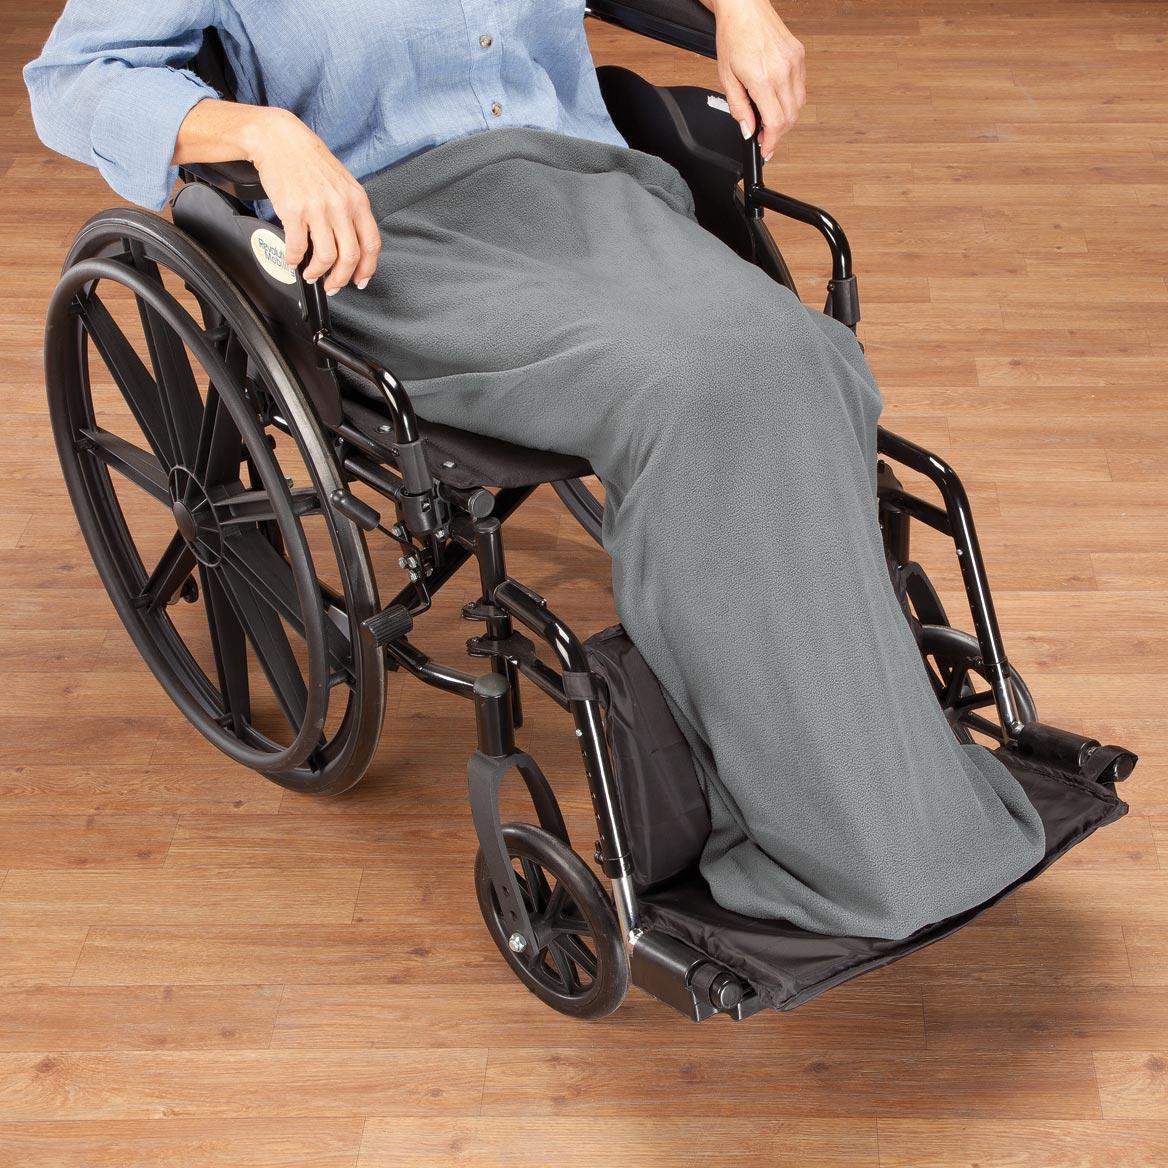 Wheelchair Leg Blanket-358518